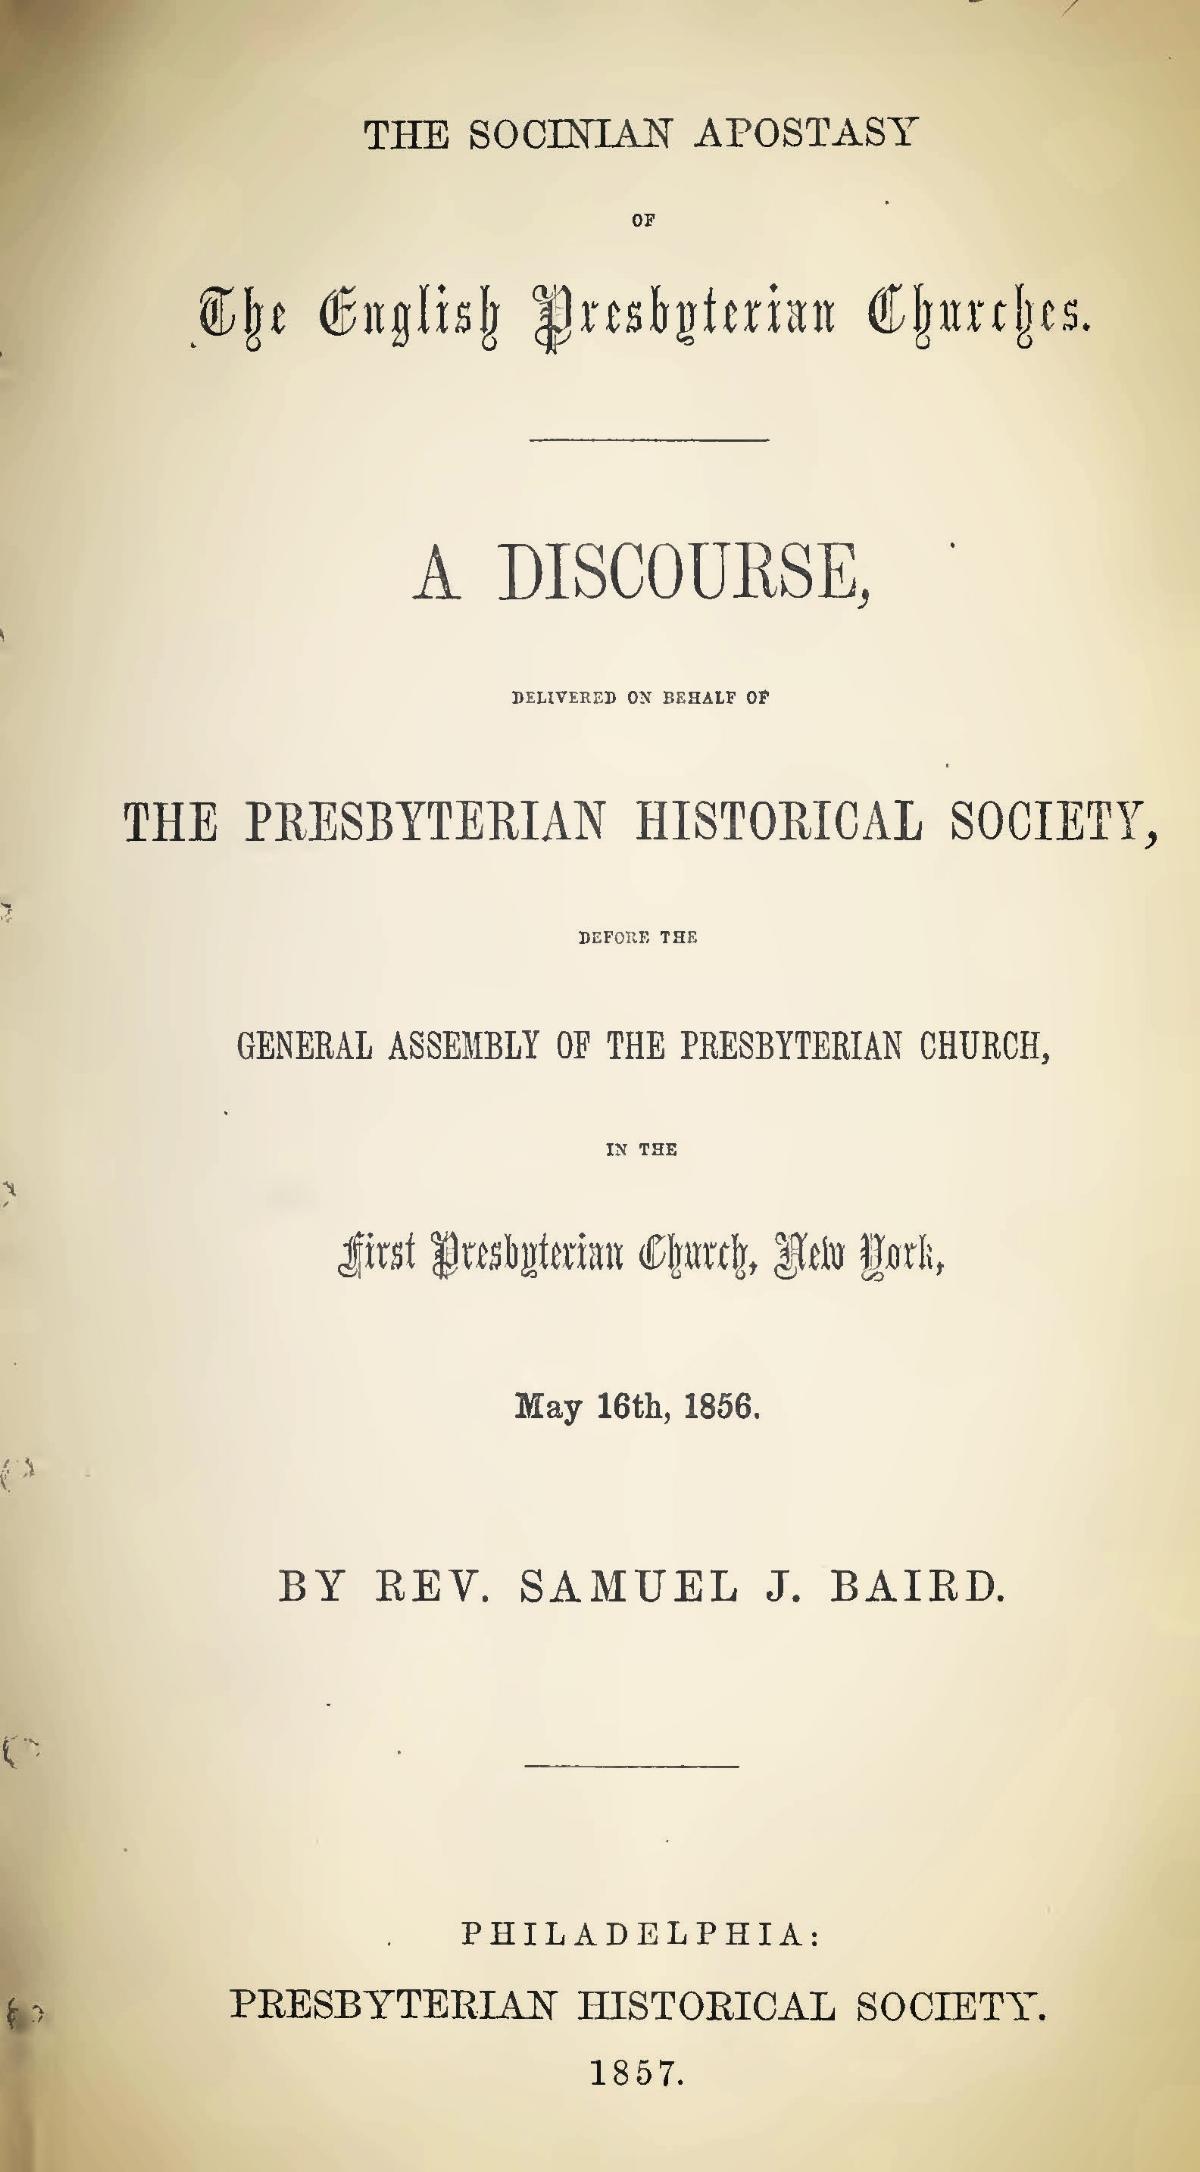 Baird, Samuel John, The Socinian Apostasy of the English Presbyterian Churches Title Page.jpg